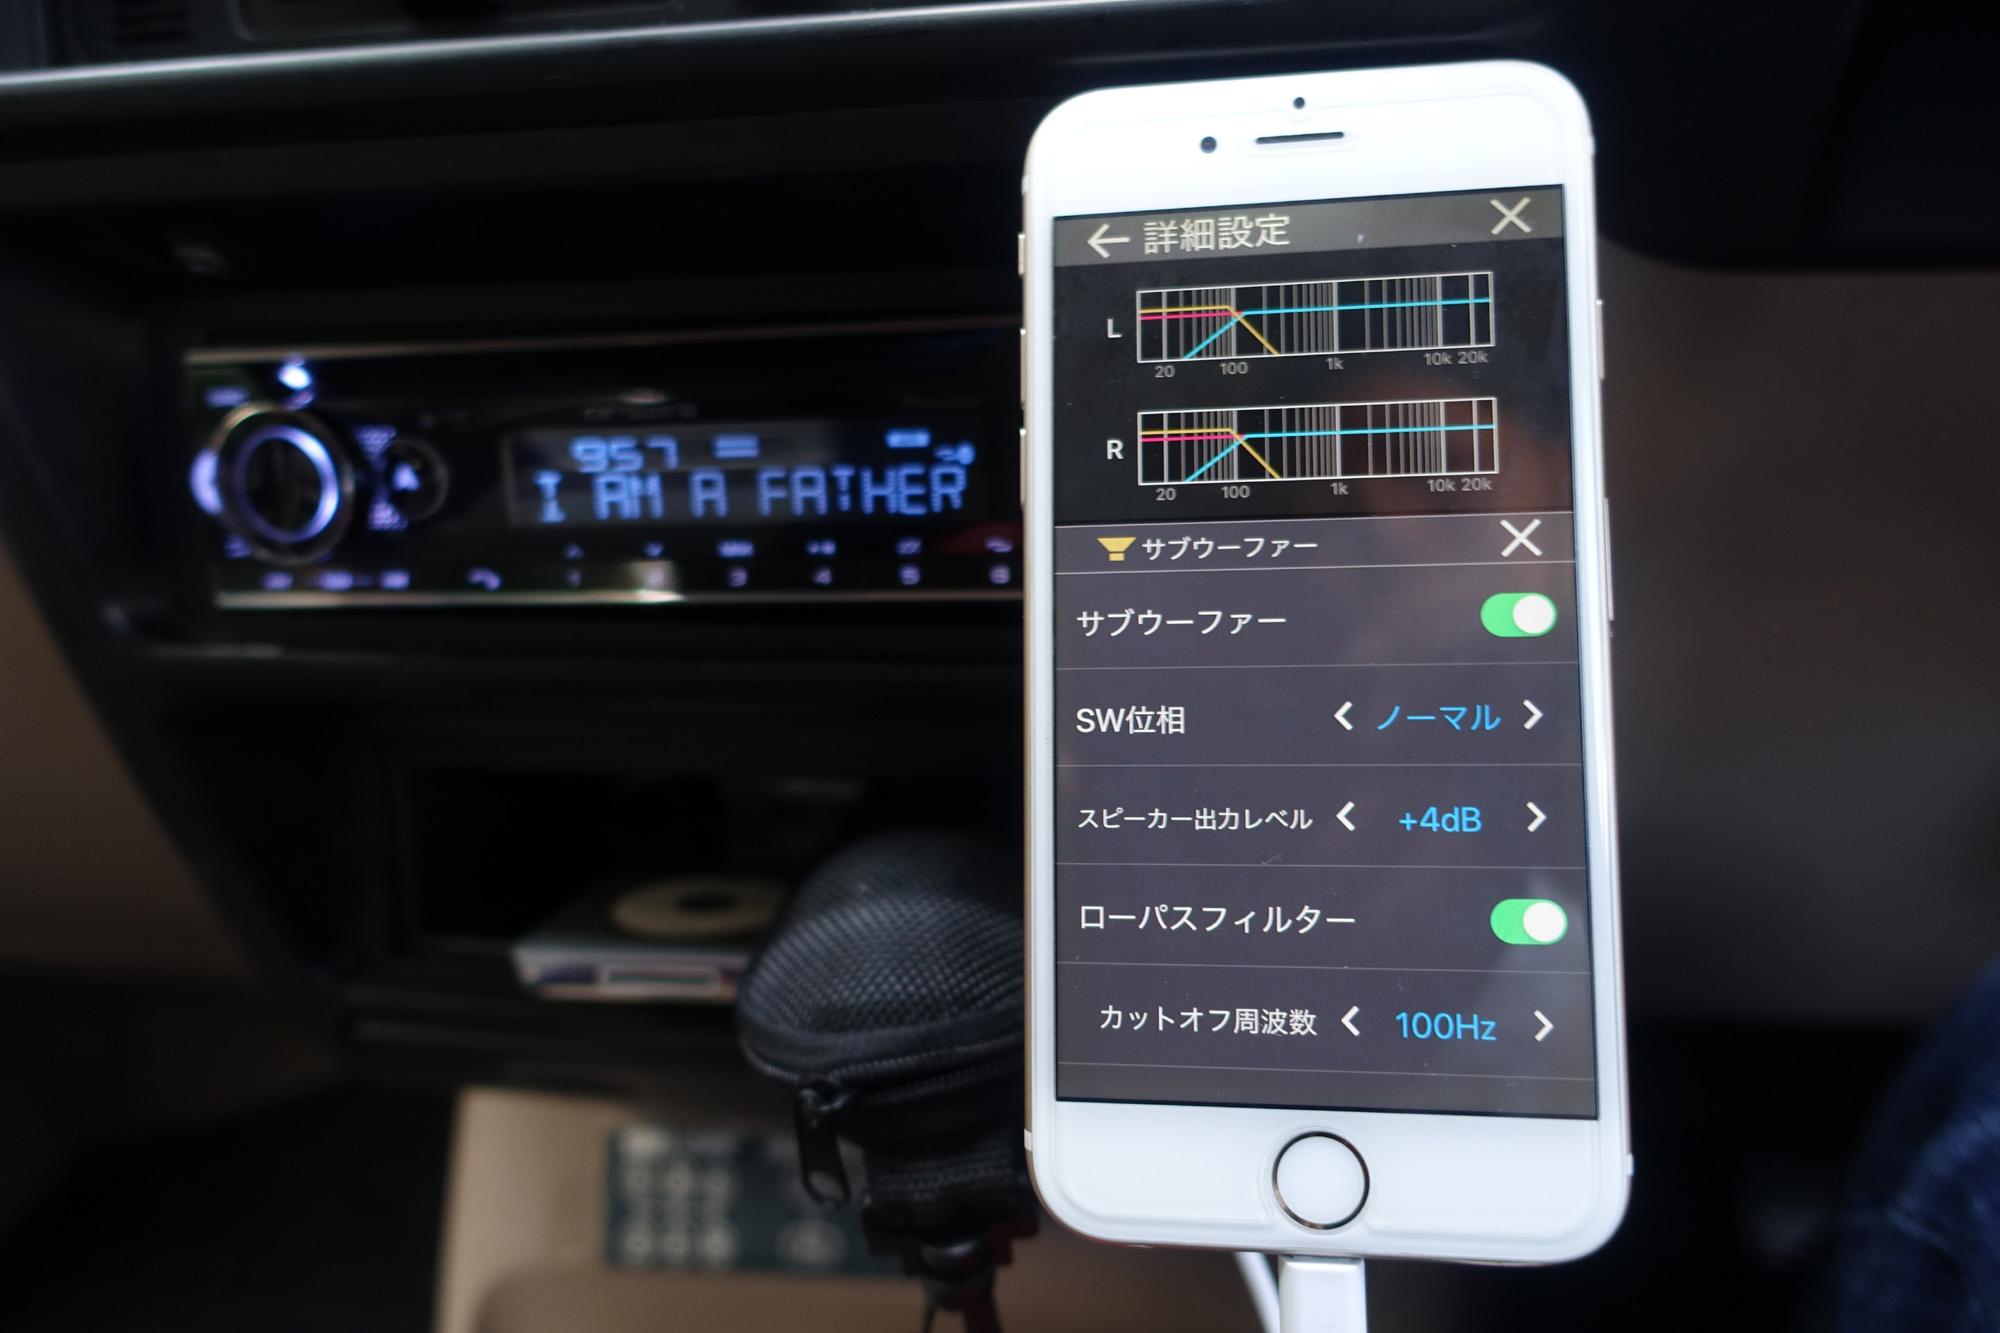 Pioneer carrozzeria DEH-6600取り付け ビッグホーン UBS-26GW isuzu